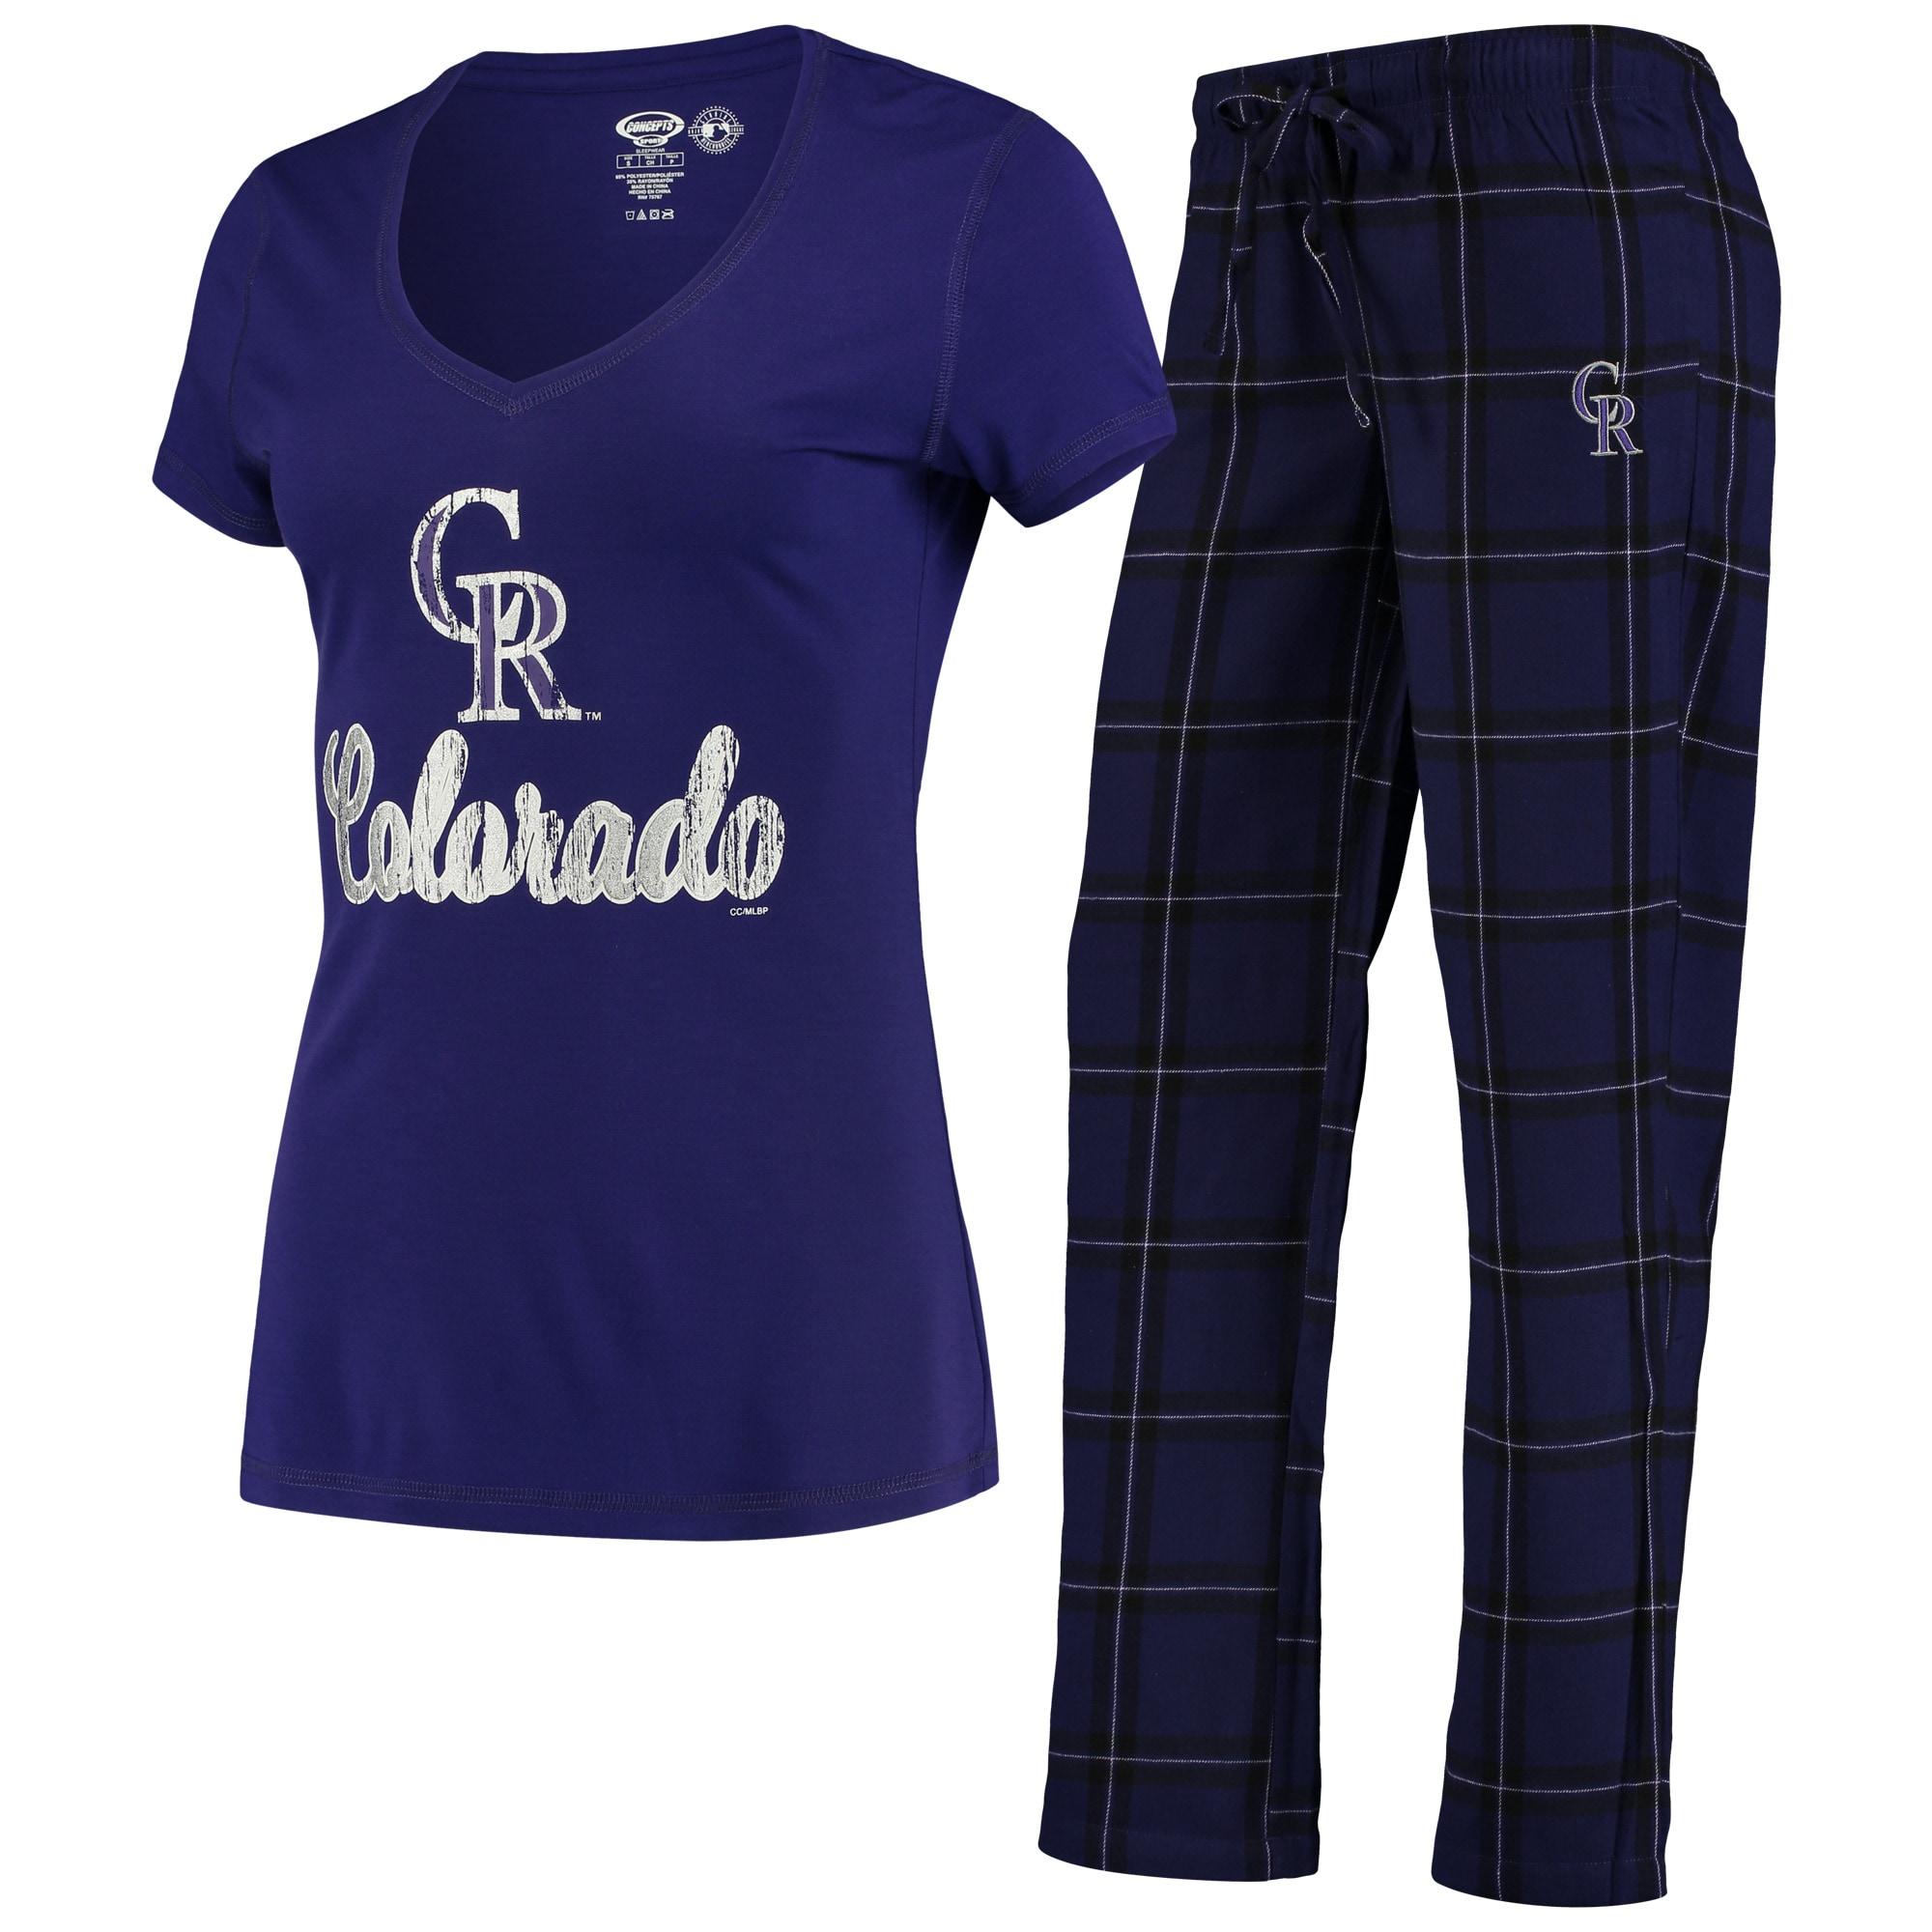 Colorado Rockies Concepts Sport Women's Troupe V-Neck T-Shirt & Pants Sleep Set - Purple/Black